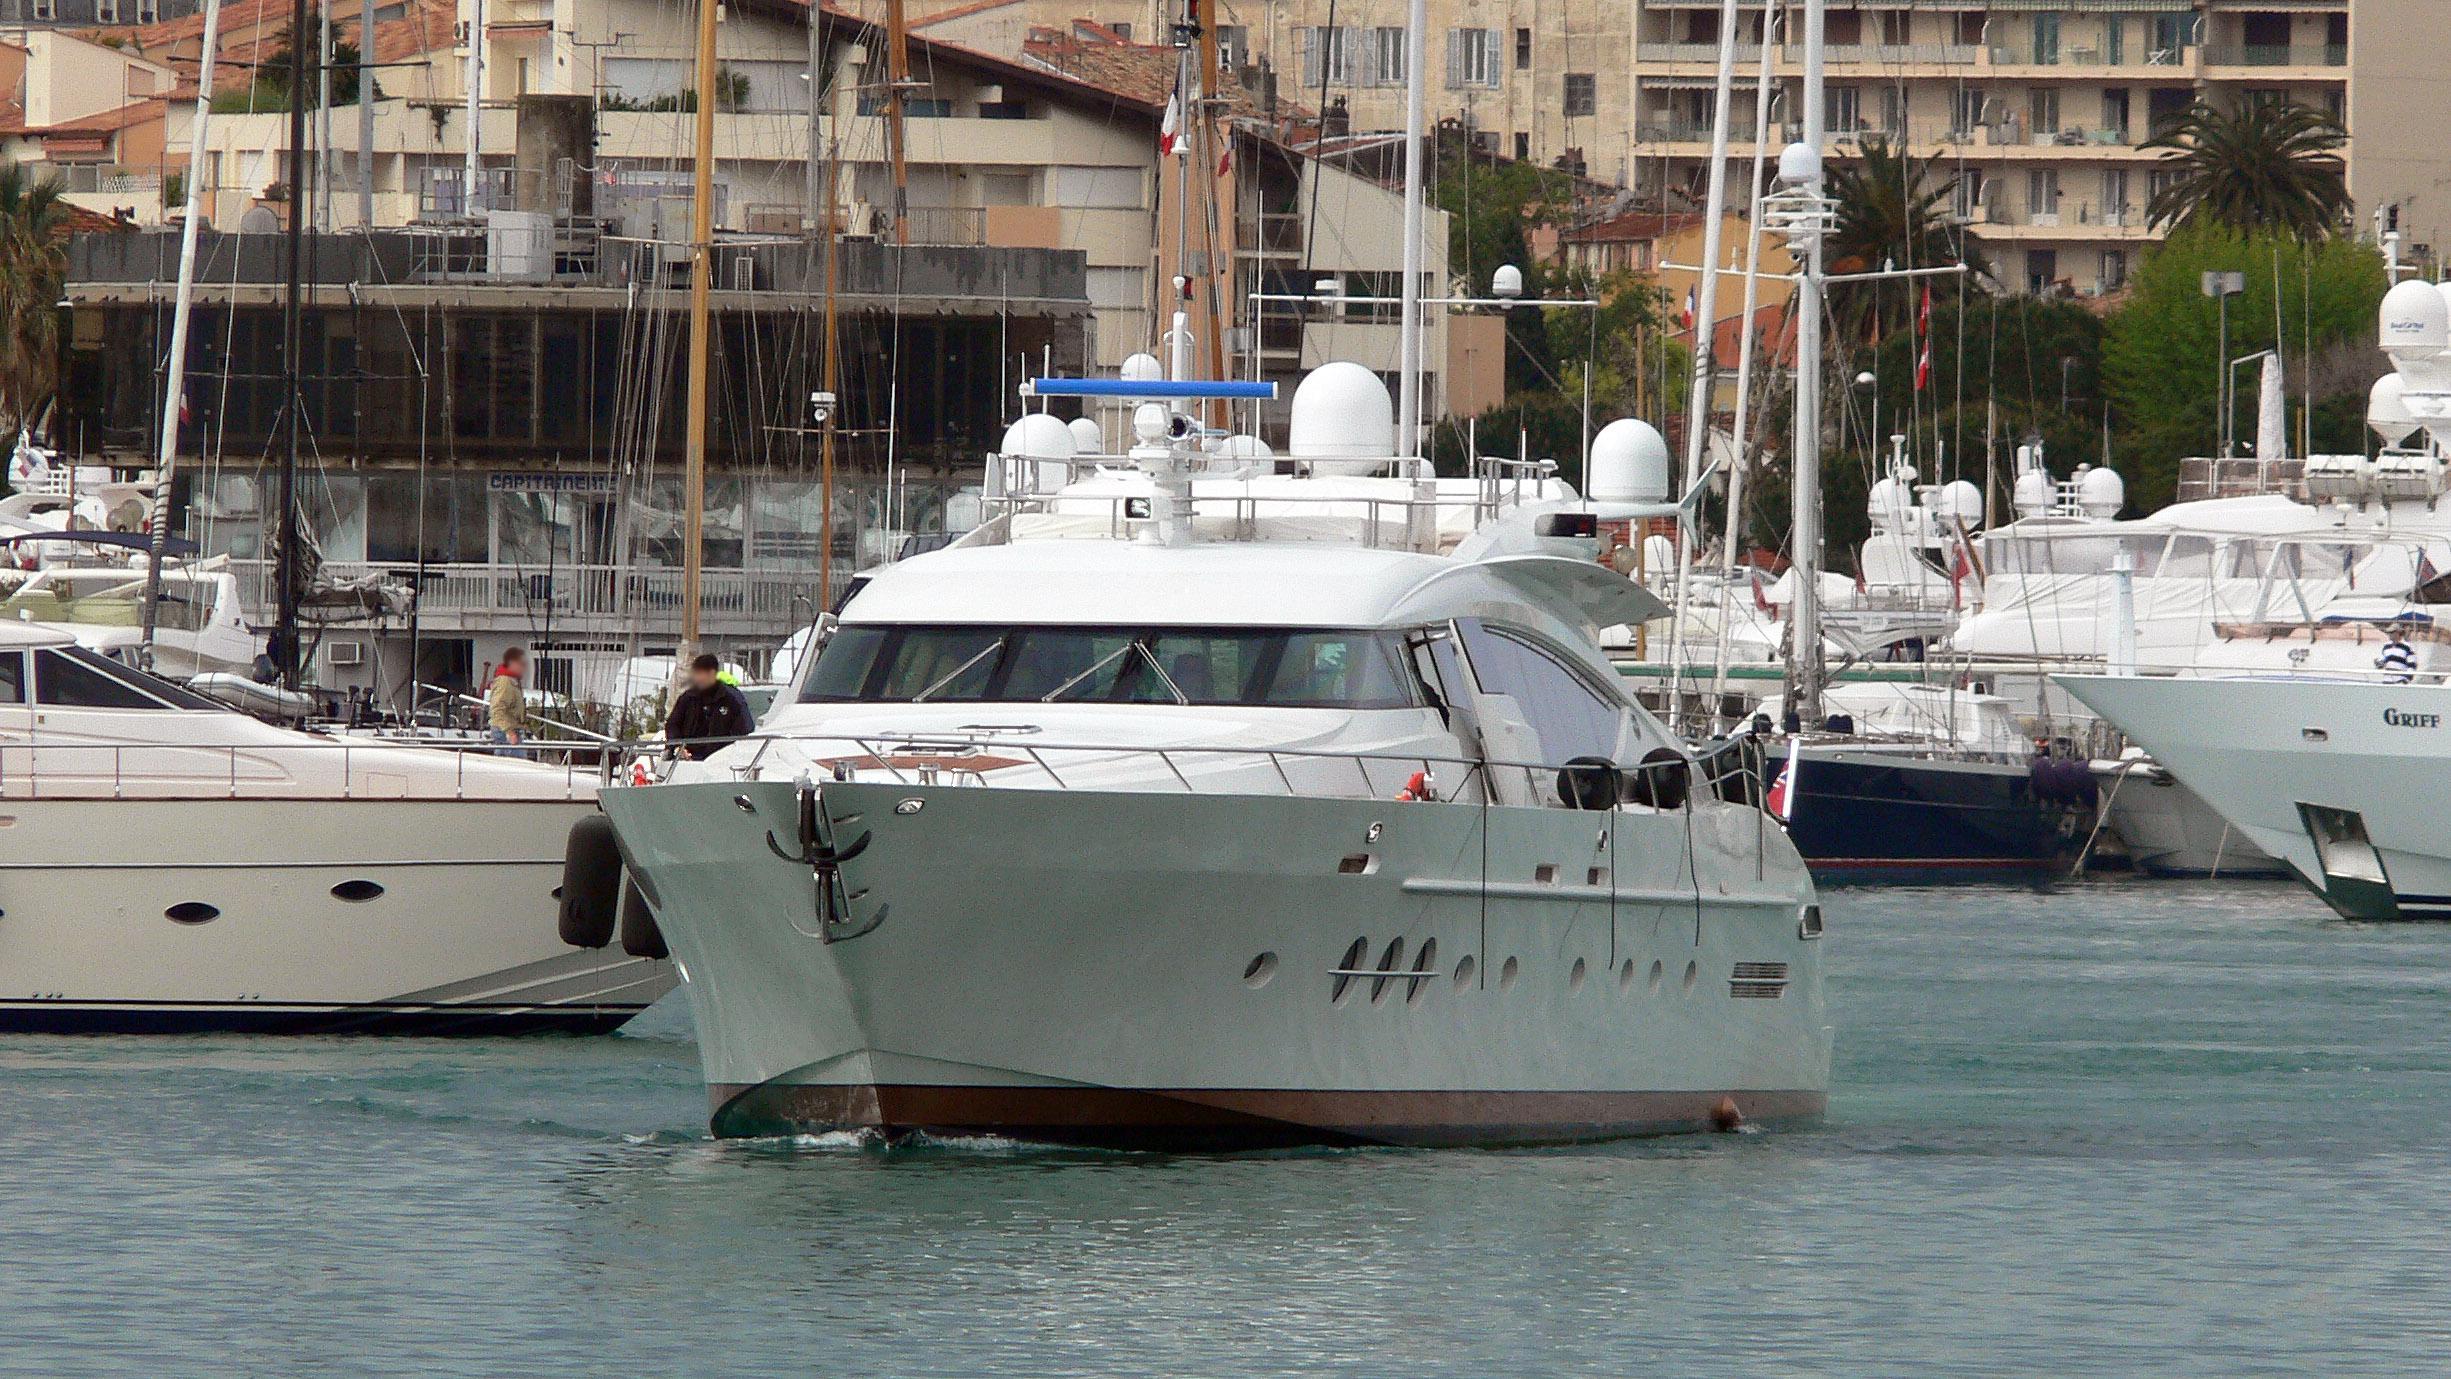 escape-ii-motor-yacht-palmer-johnson-120-2005-37m-bow